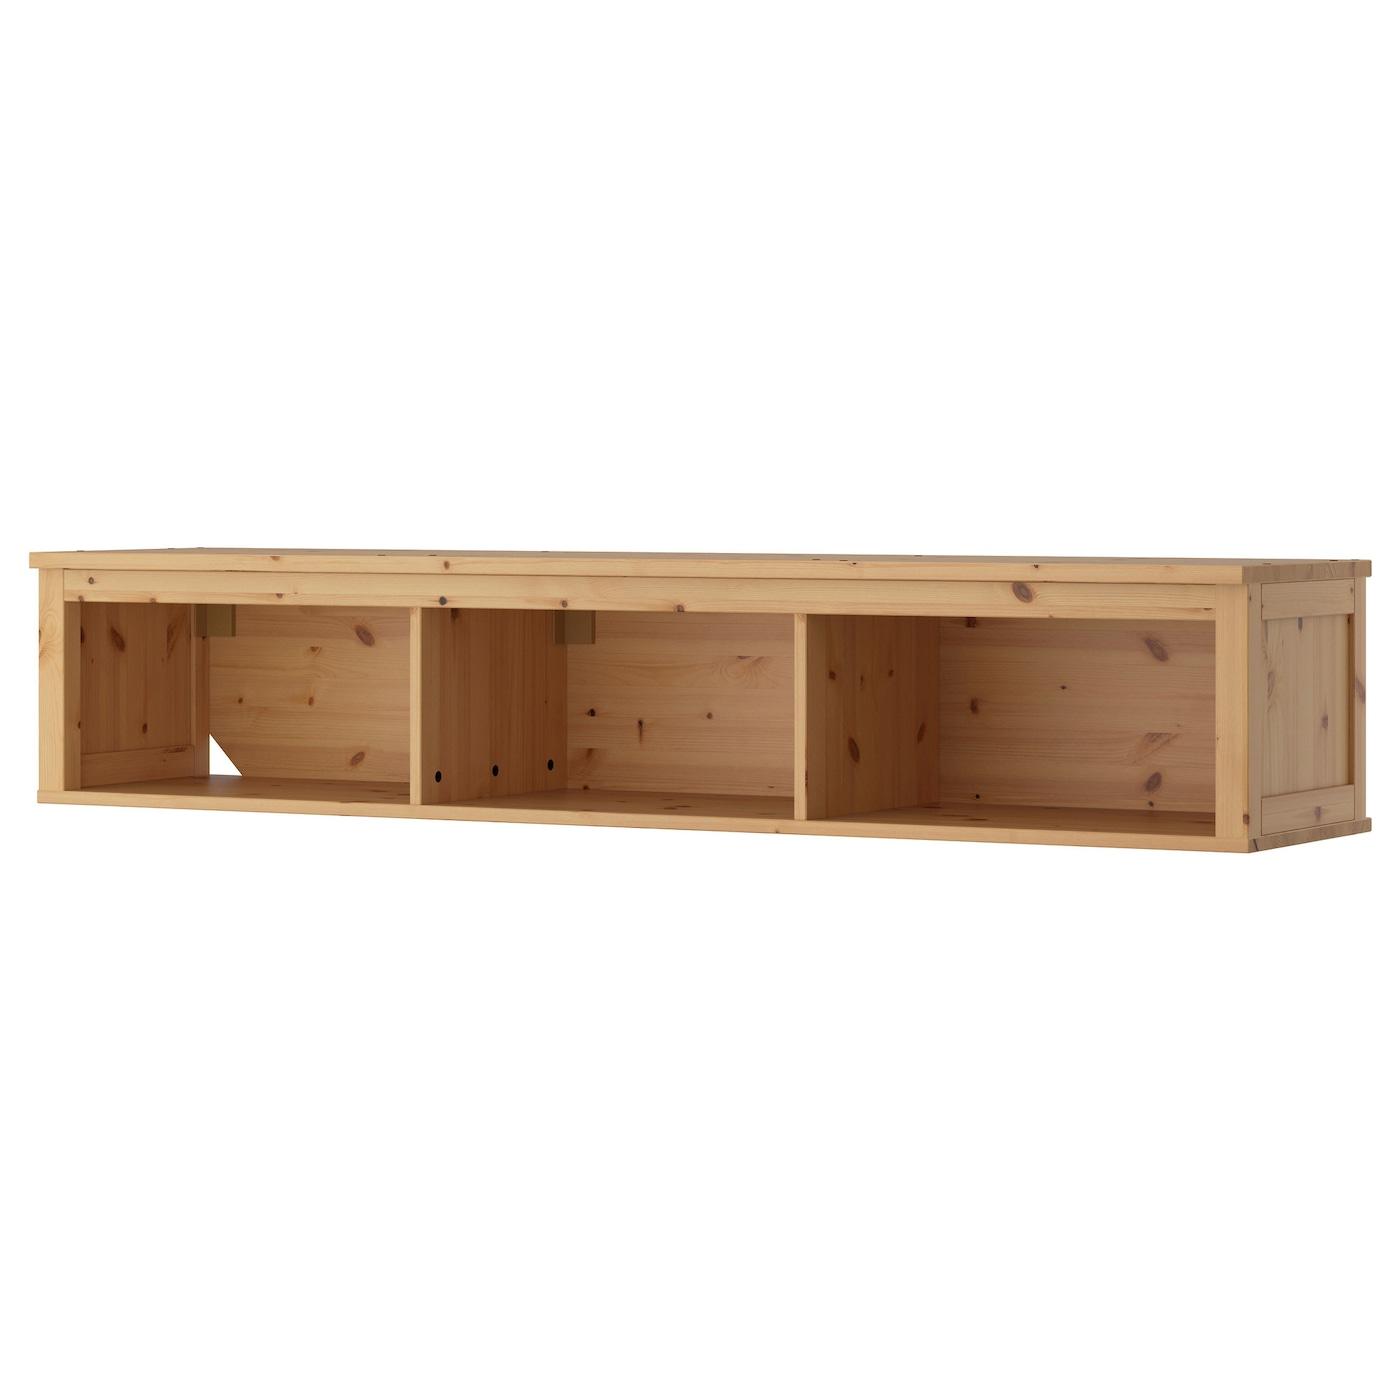 hemnes wall bridging shelf light brown 183x37 cm ikea. Black Bedroom Furniture Sets. Home Design Ideas